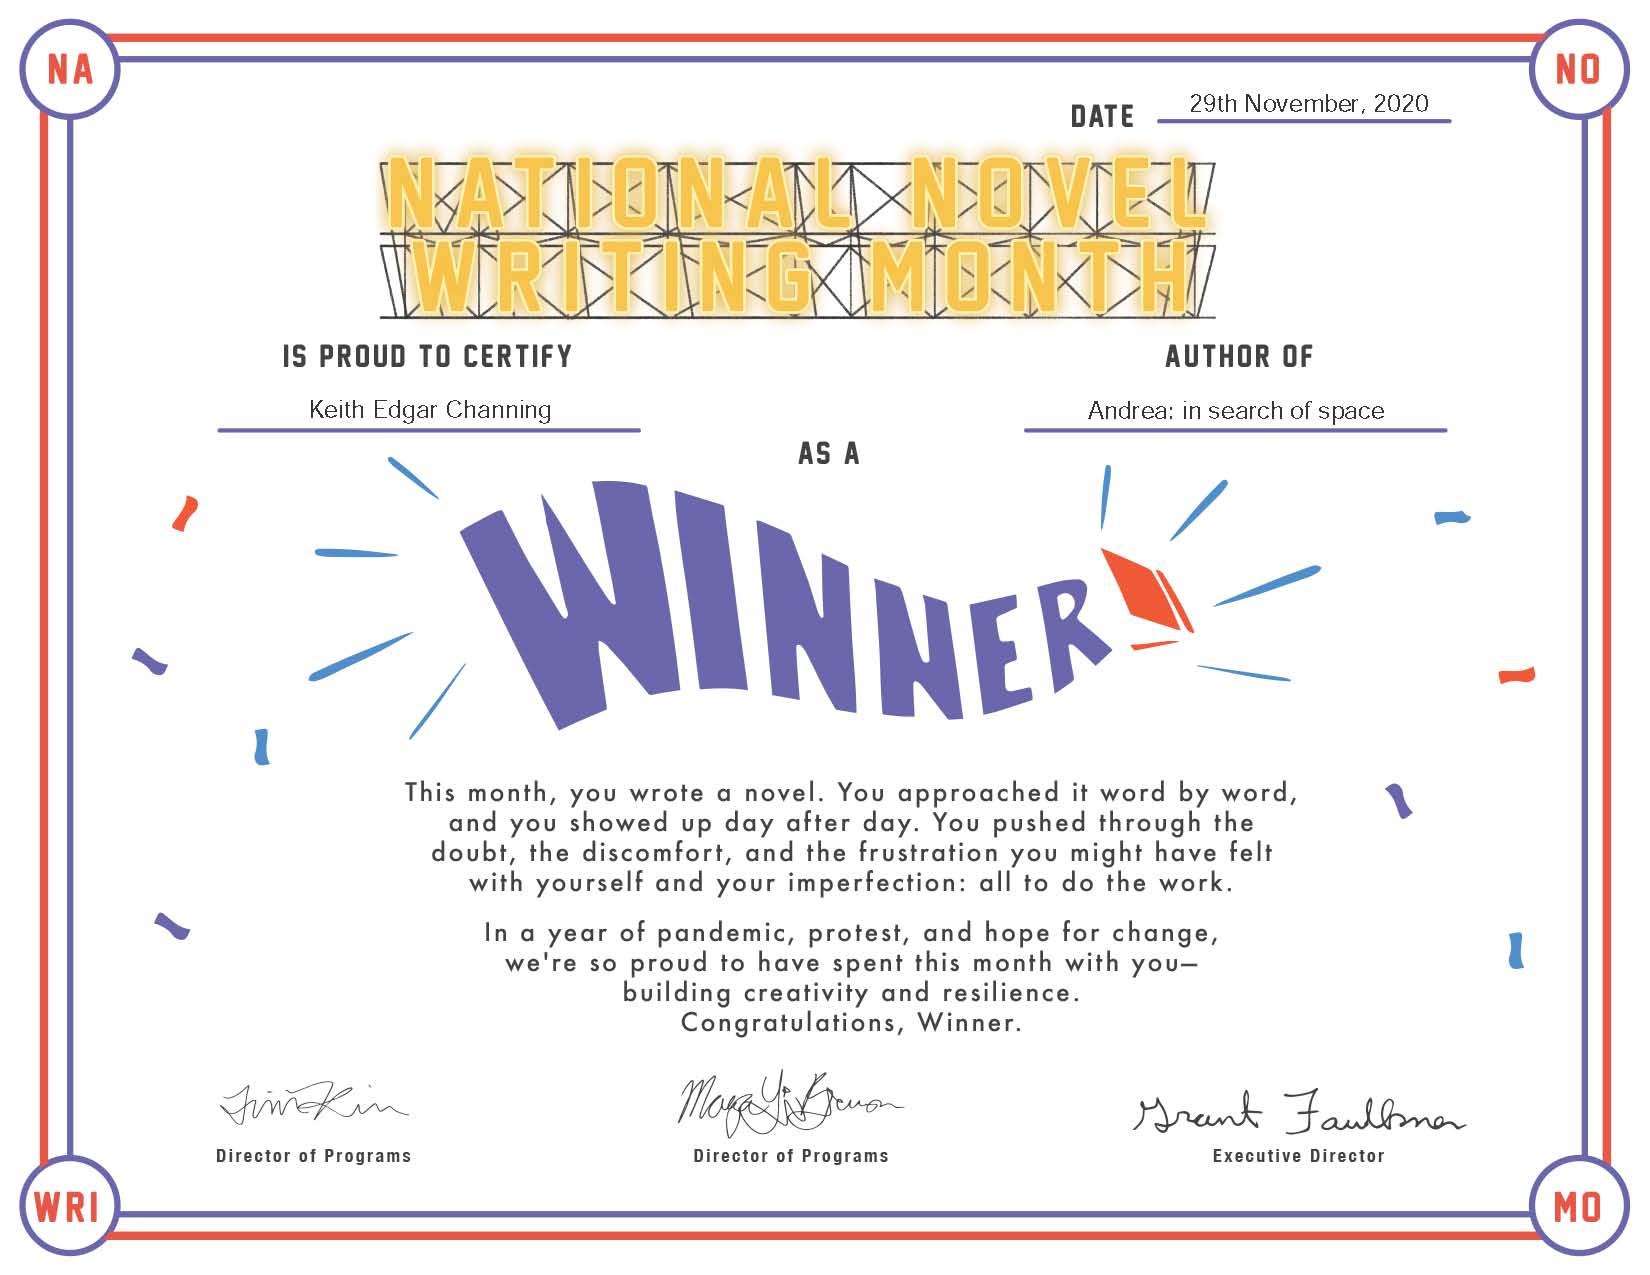 NaNo-2020-Winner-Certificate2